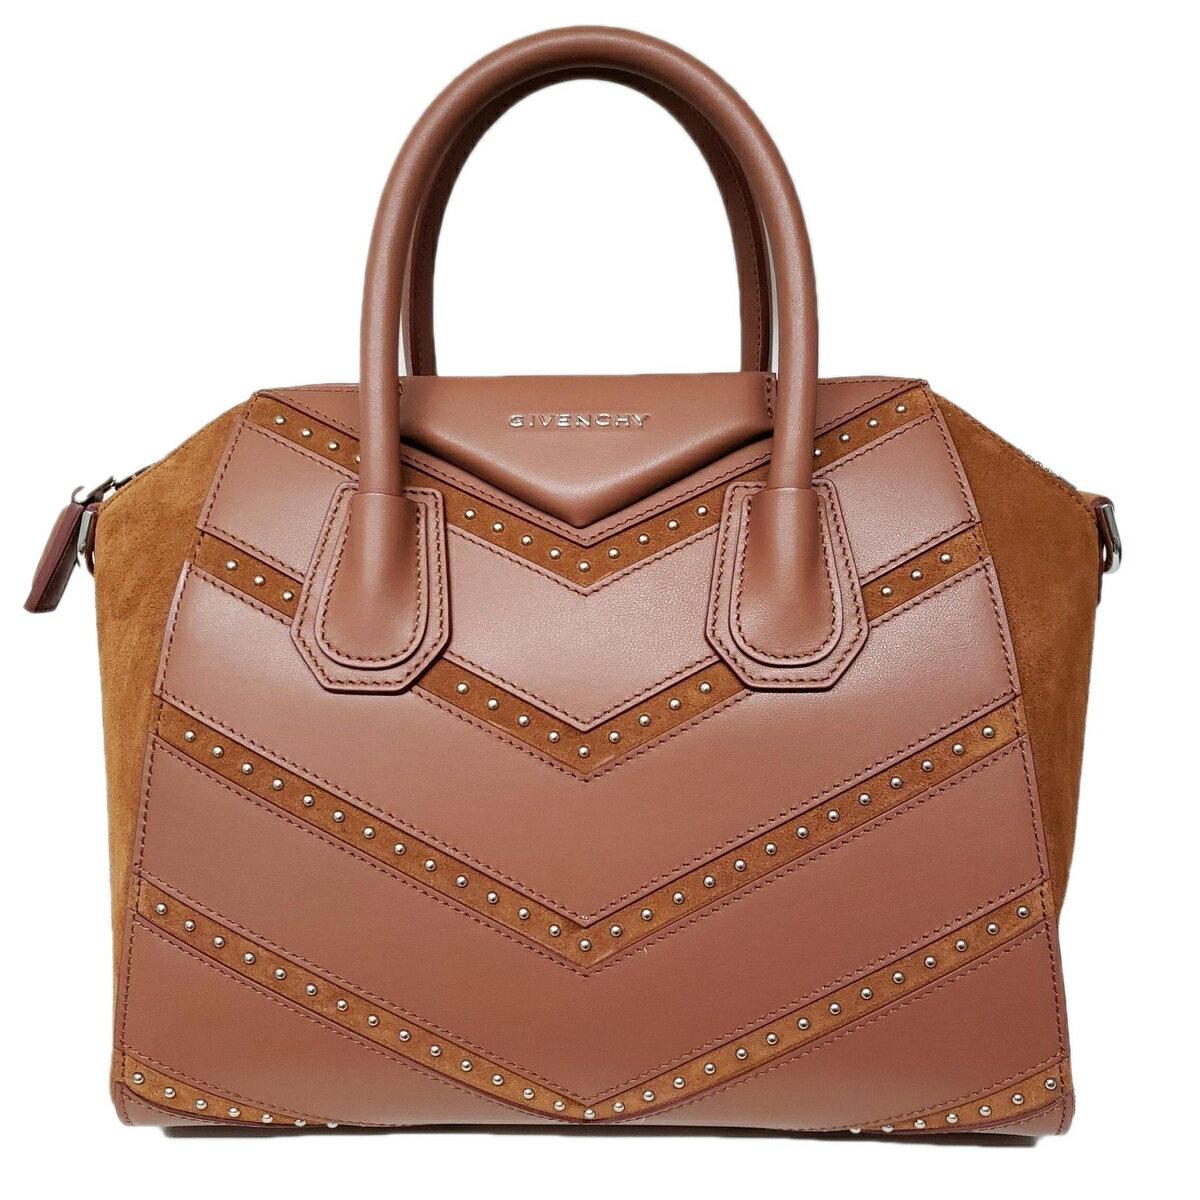 Givenchy ジバンシー Antigona アンティゴナ シェブロンスタッズ S レザーボストンバッグ ブラウン Chevron Studded Small Antigona Satchel Brown Leather Shoulder Bag